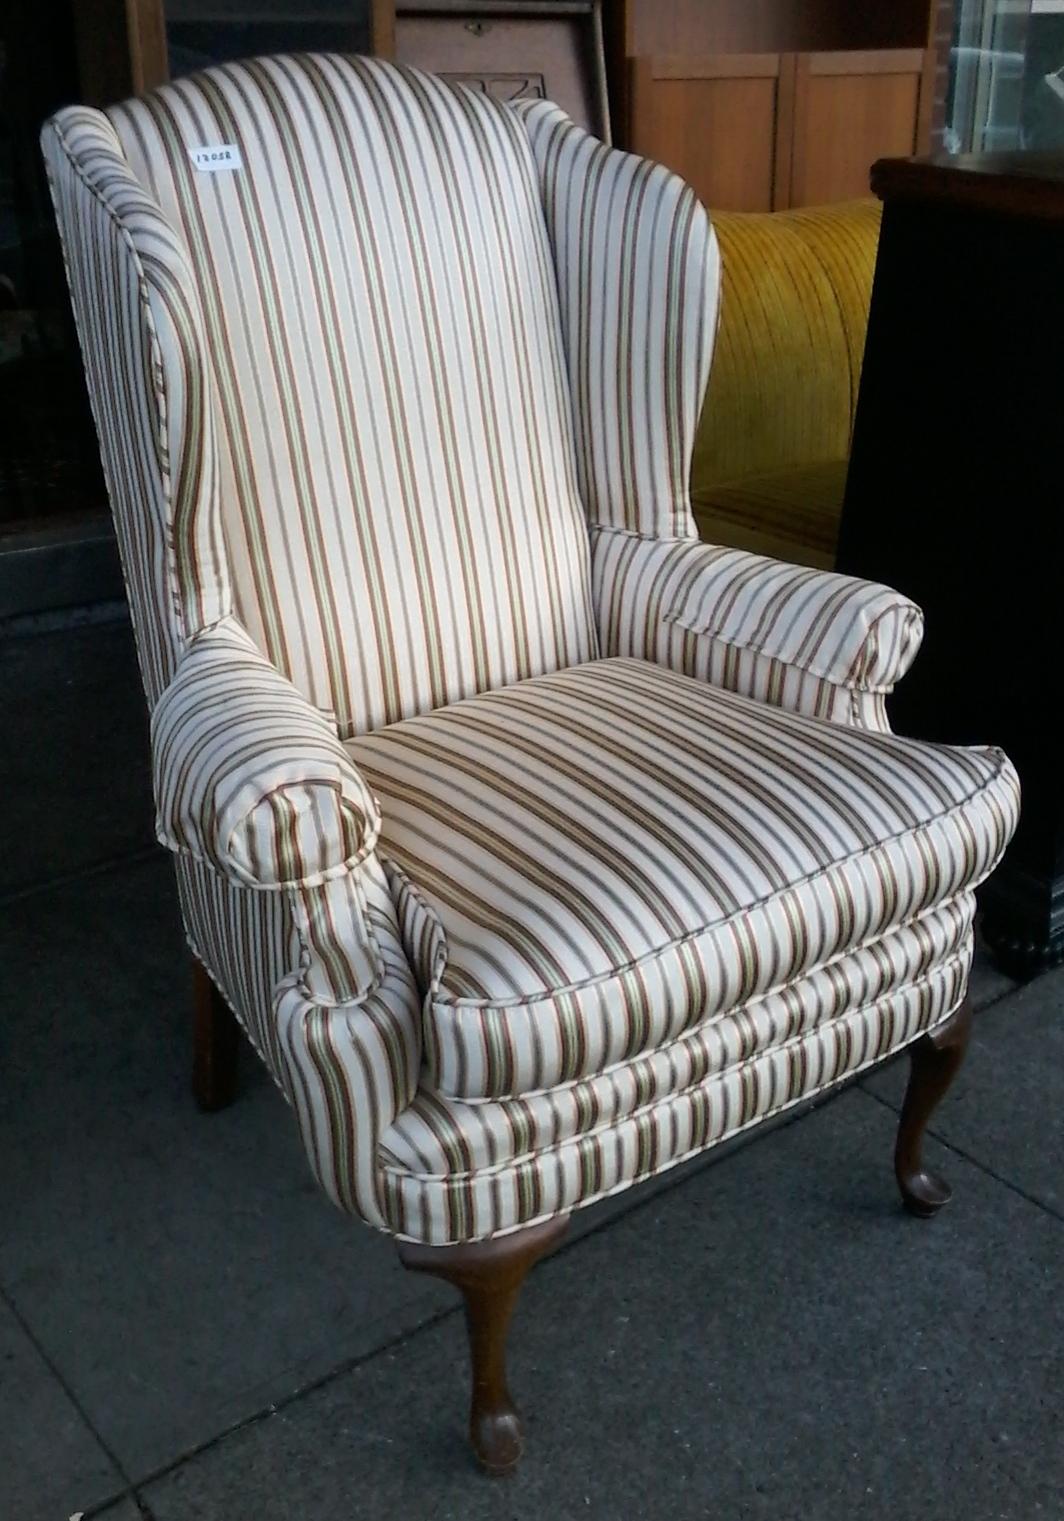 SOLD #12058 Regency Striped Wingback Chair   $125